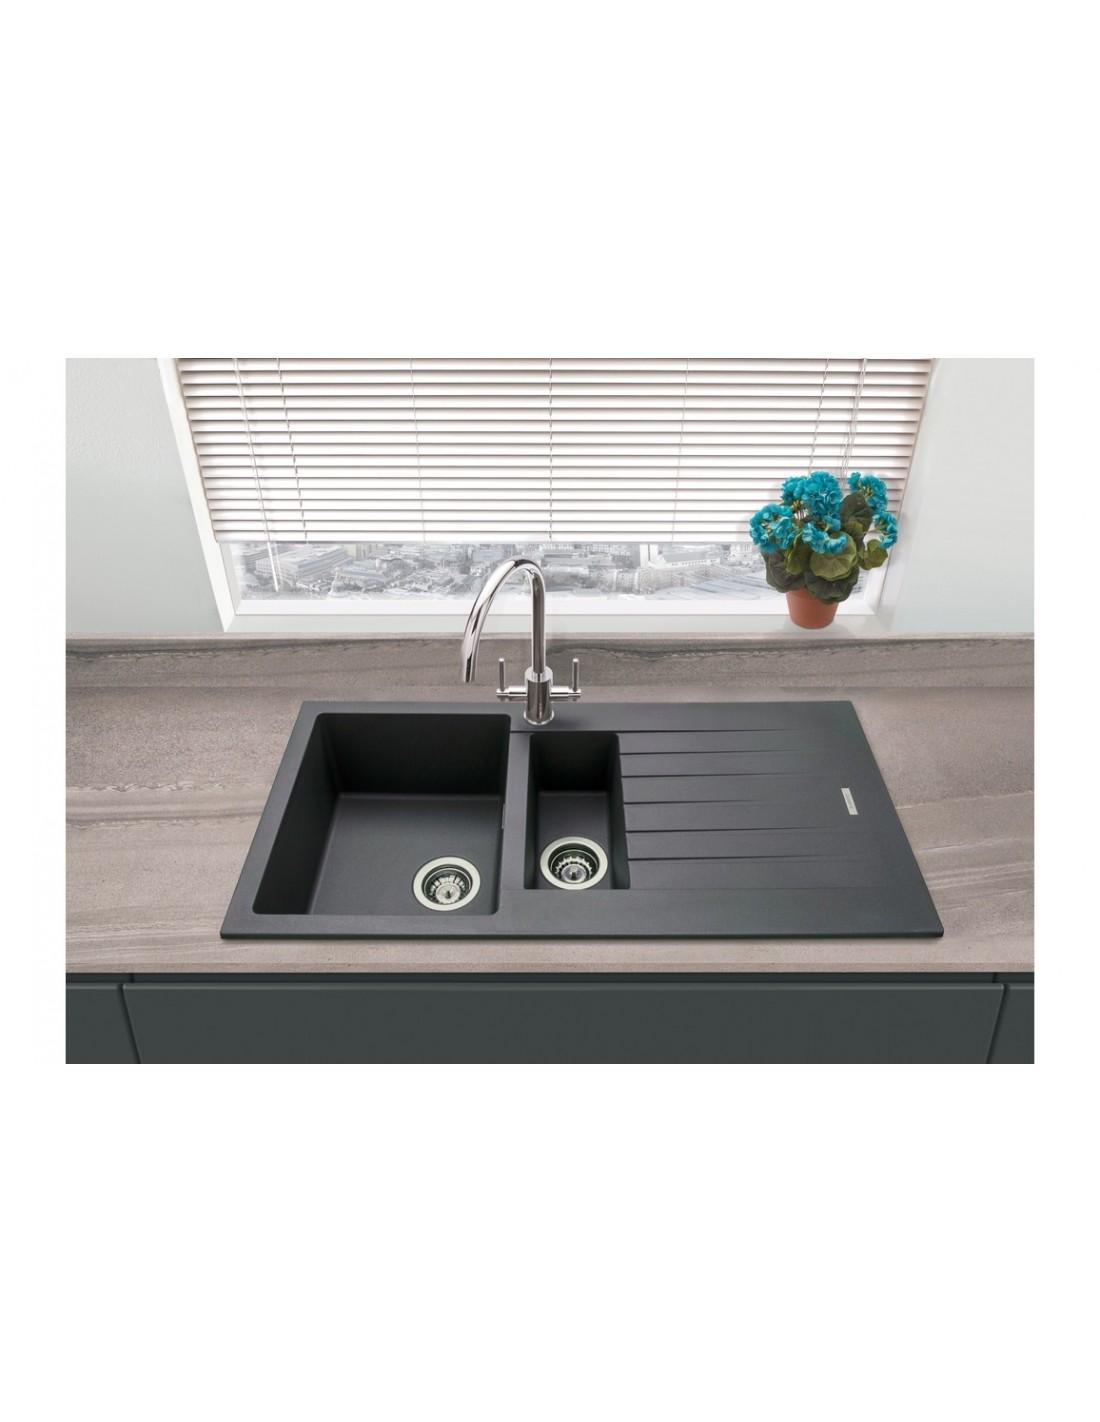 Matt Light Grey Granite Quartz Kitchen Sink 1000 X 500mm